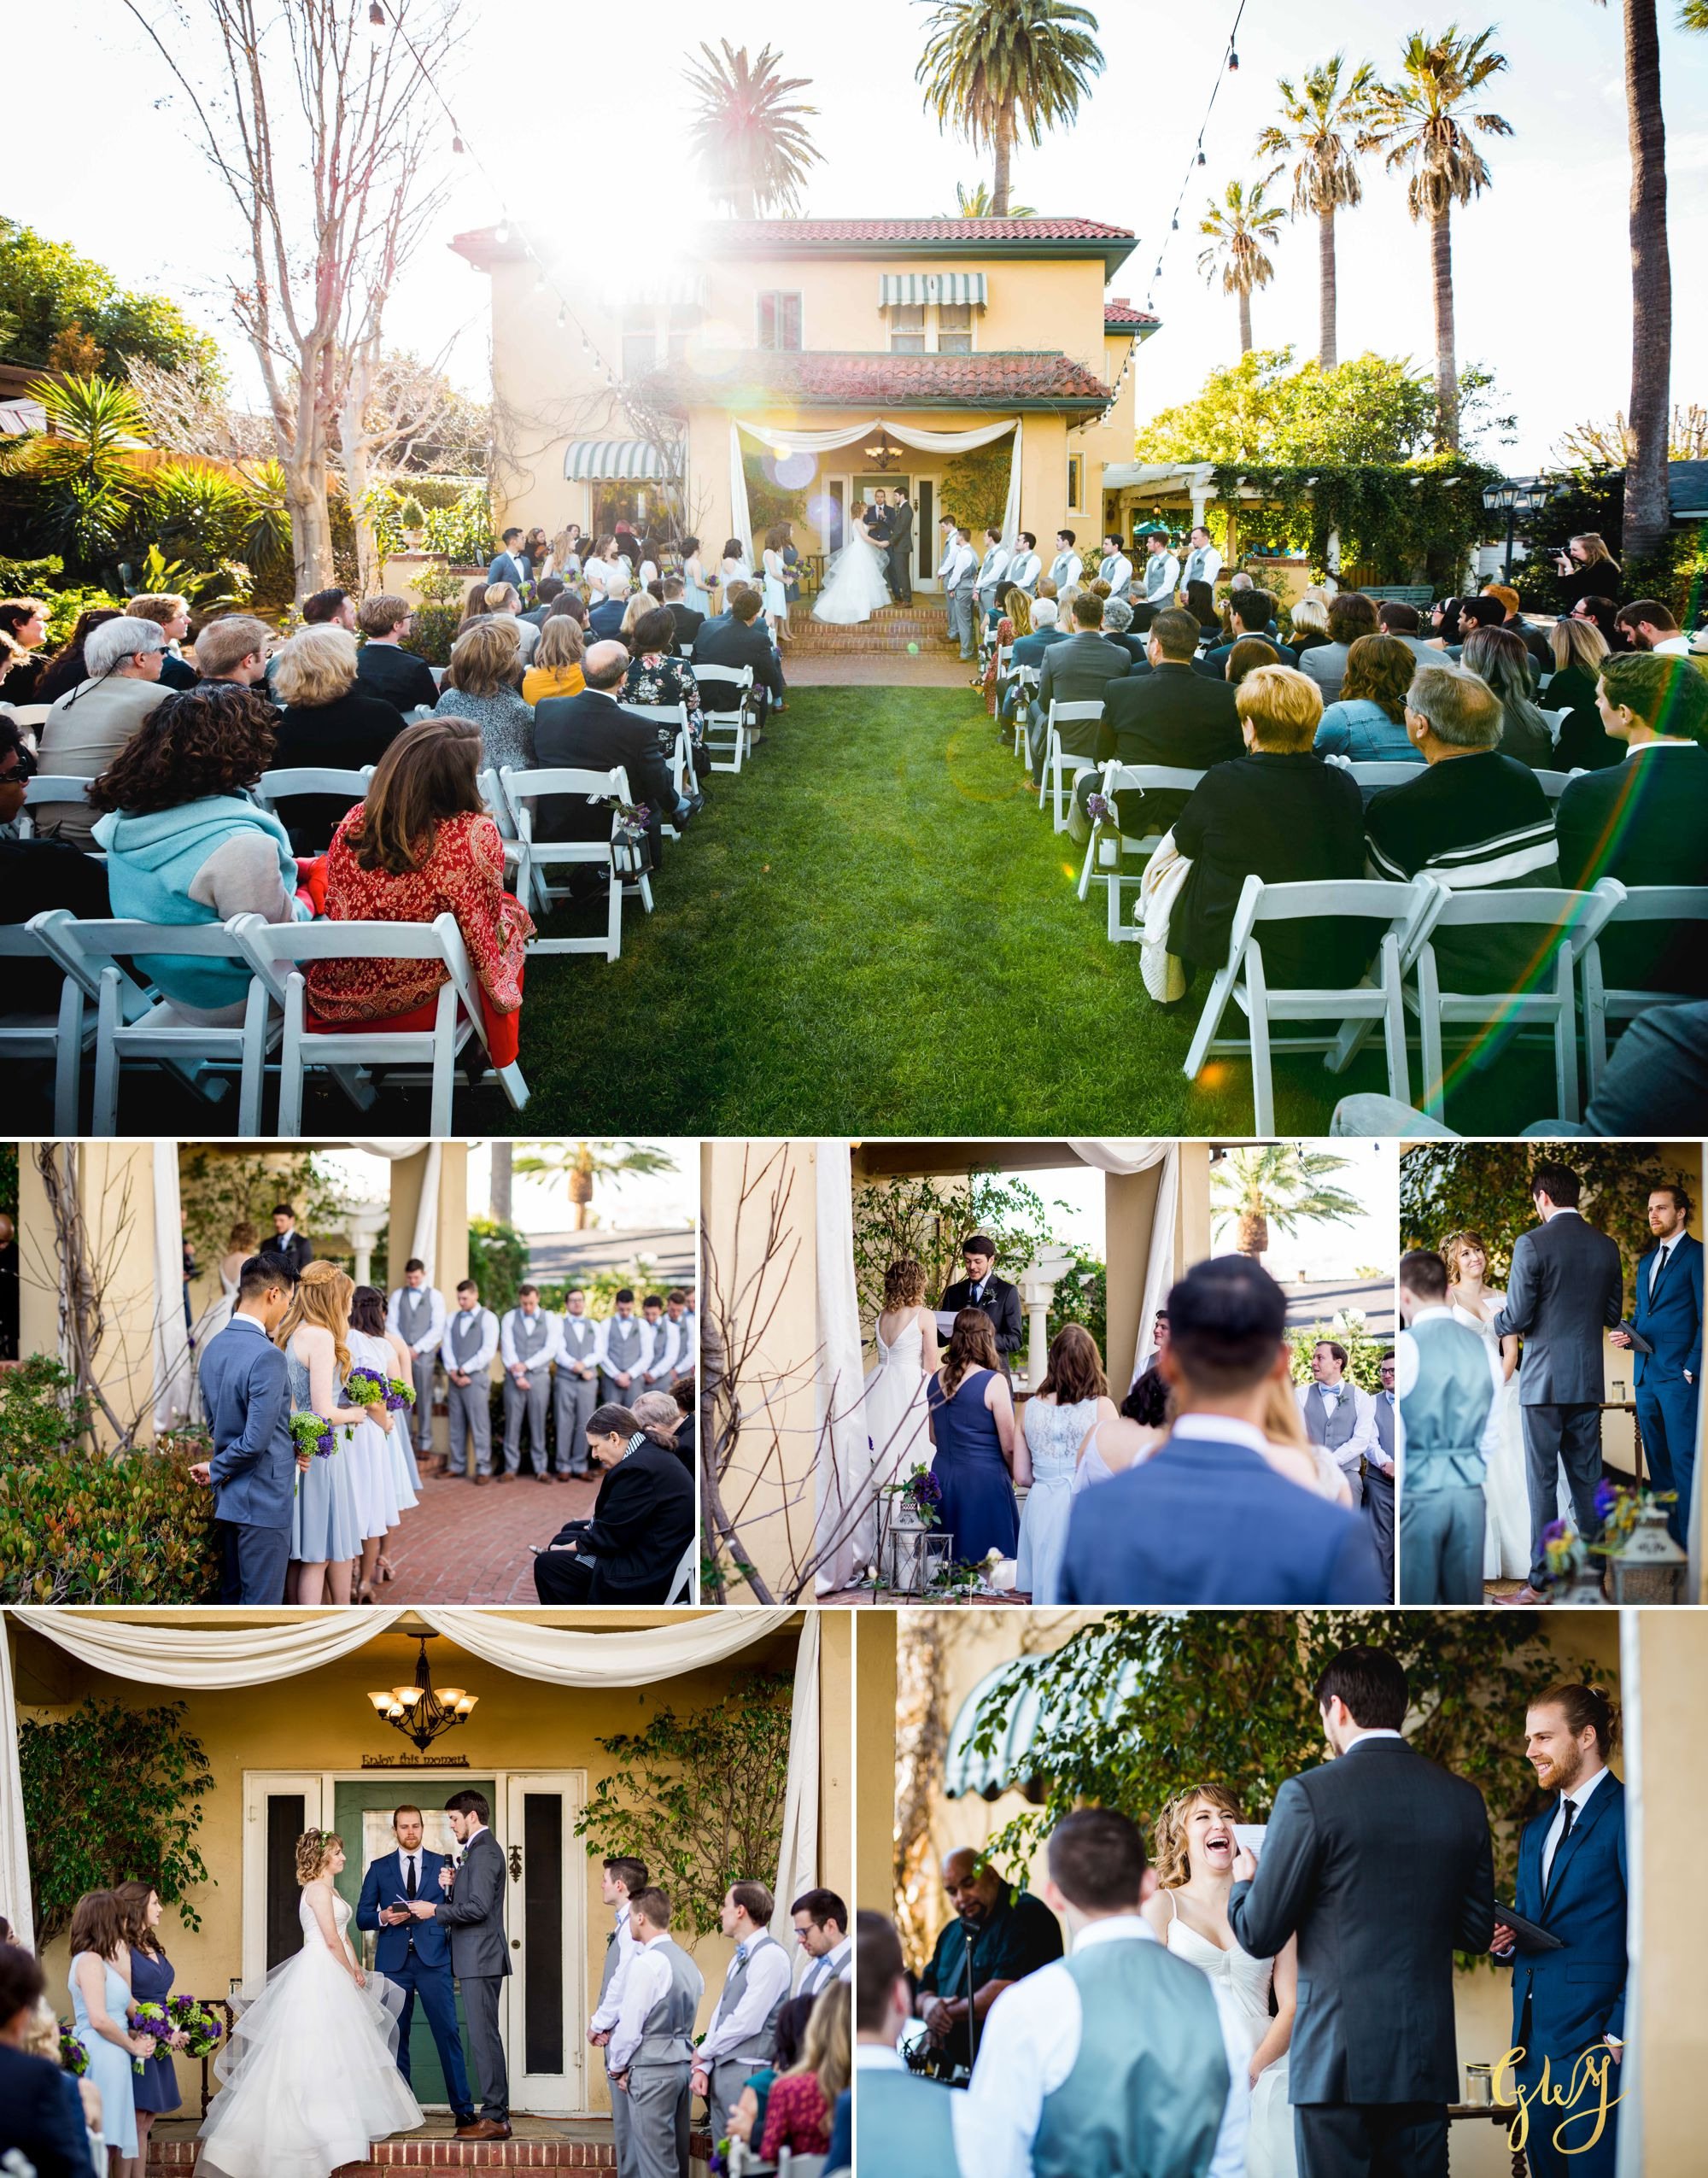 Garrett + Michelle's French Estate Orange County Spring Wedding by Glass Woods Media 23.jpg